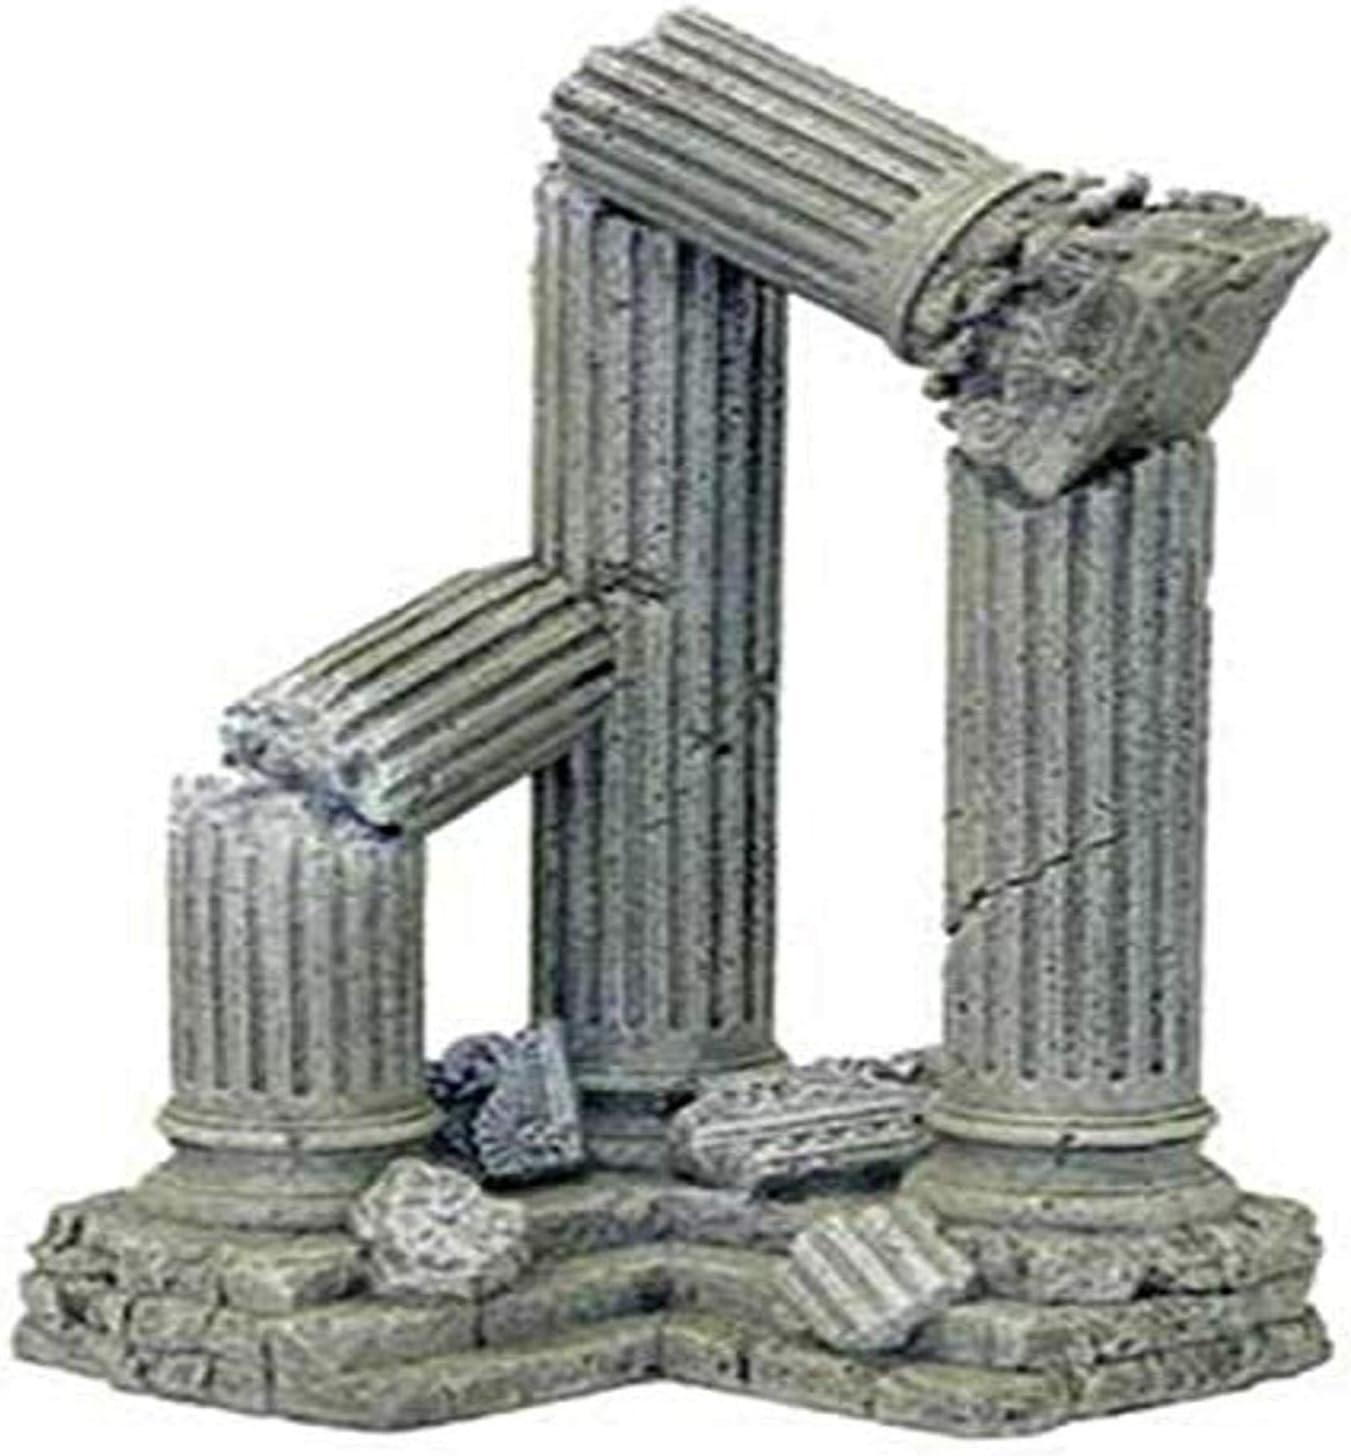 Blue Ribbon Pet Products Resin Aquarium Ornament - Three Column Ruins Corner Section, 9 L x 6.5 D x 11 H Inch (006311)